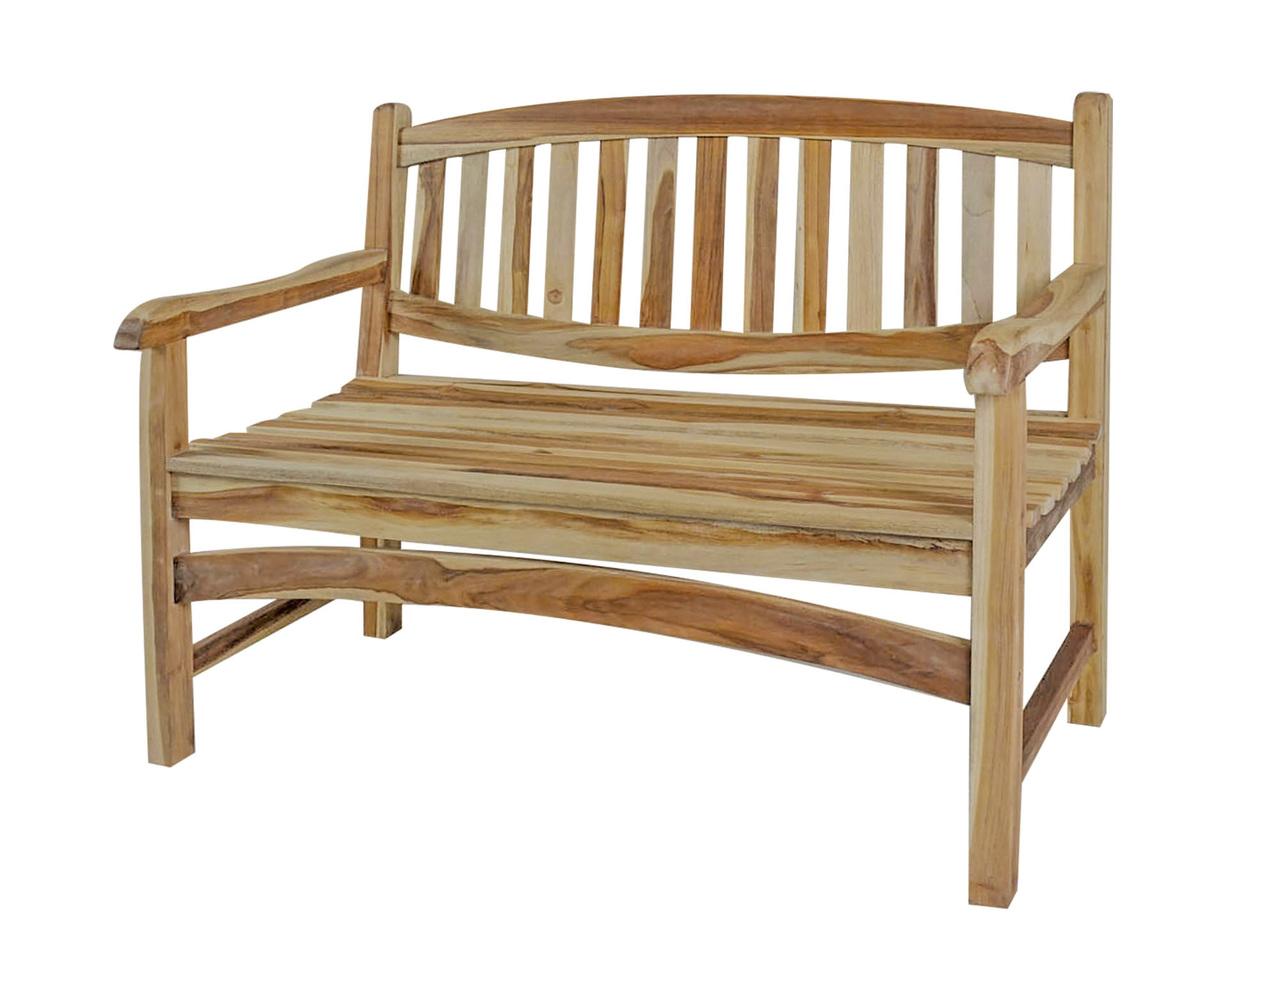 Awesome Kent Garden 47 Inch Length Solid Teak Outdoor Garden Bench Cjindustries Chair Design For Home Cjindustriesco